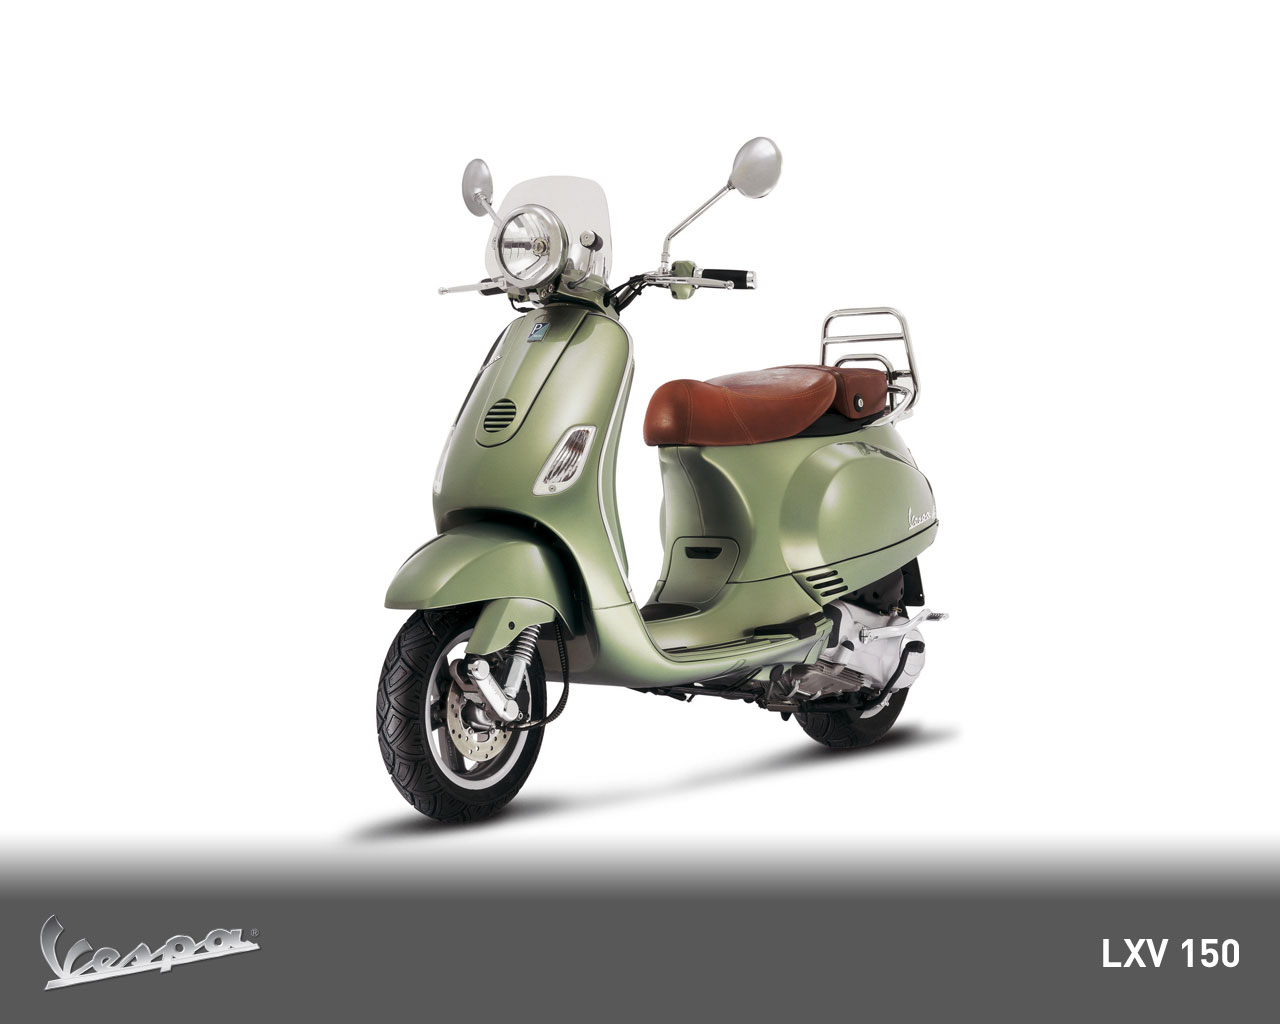 vespa lxv 150 specs - 2008, 2009 - autoevolution